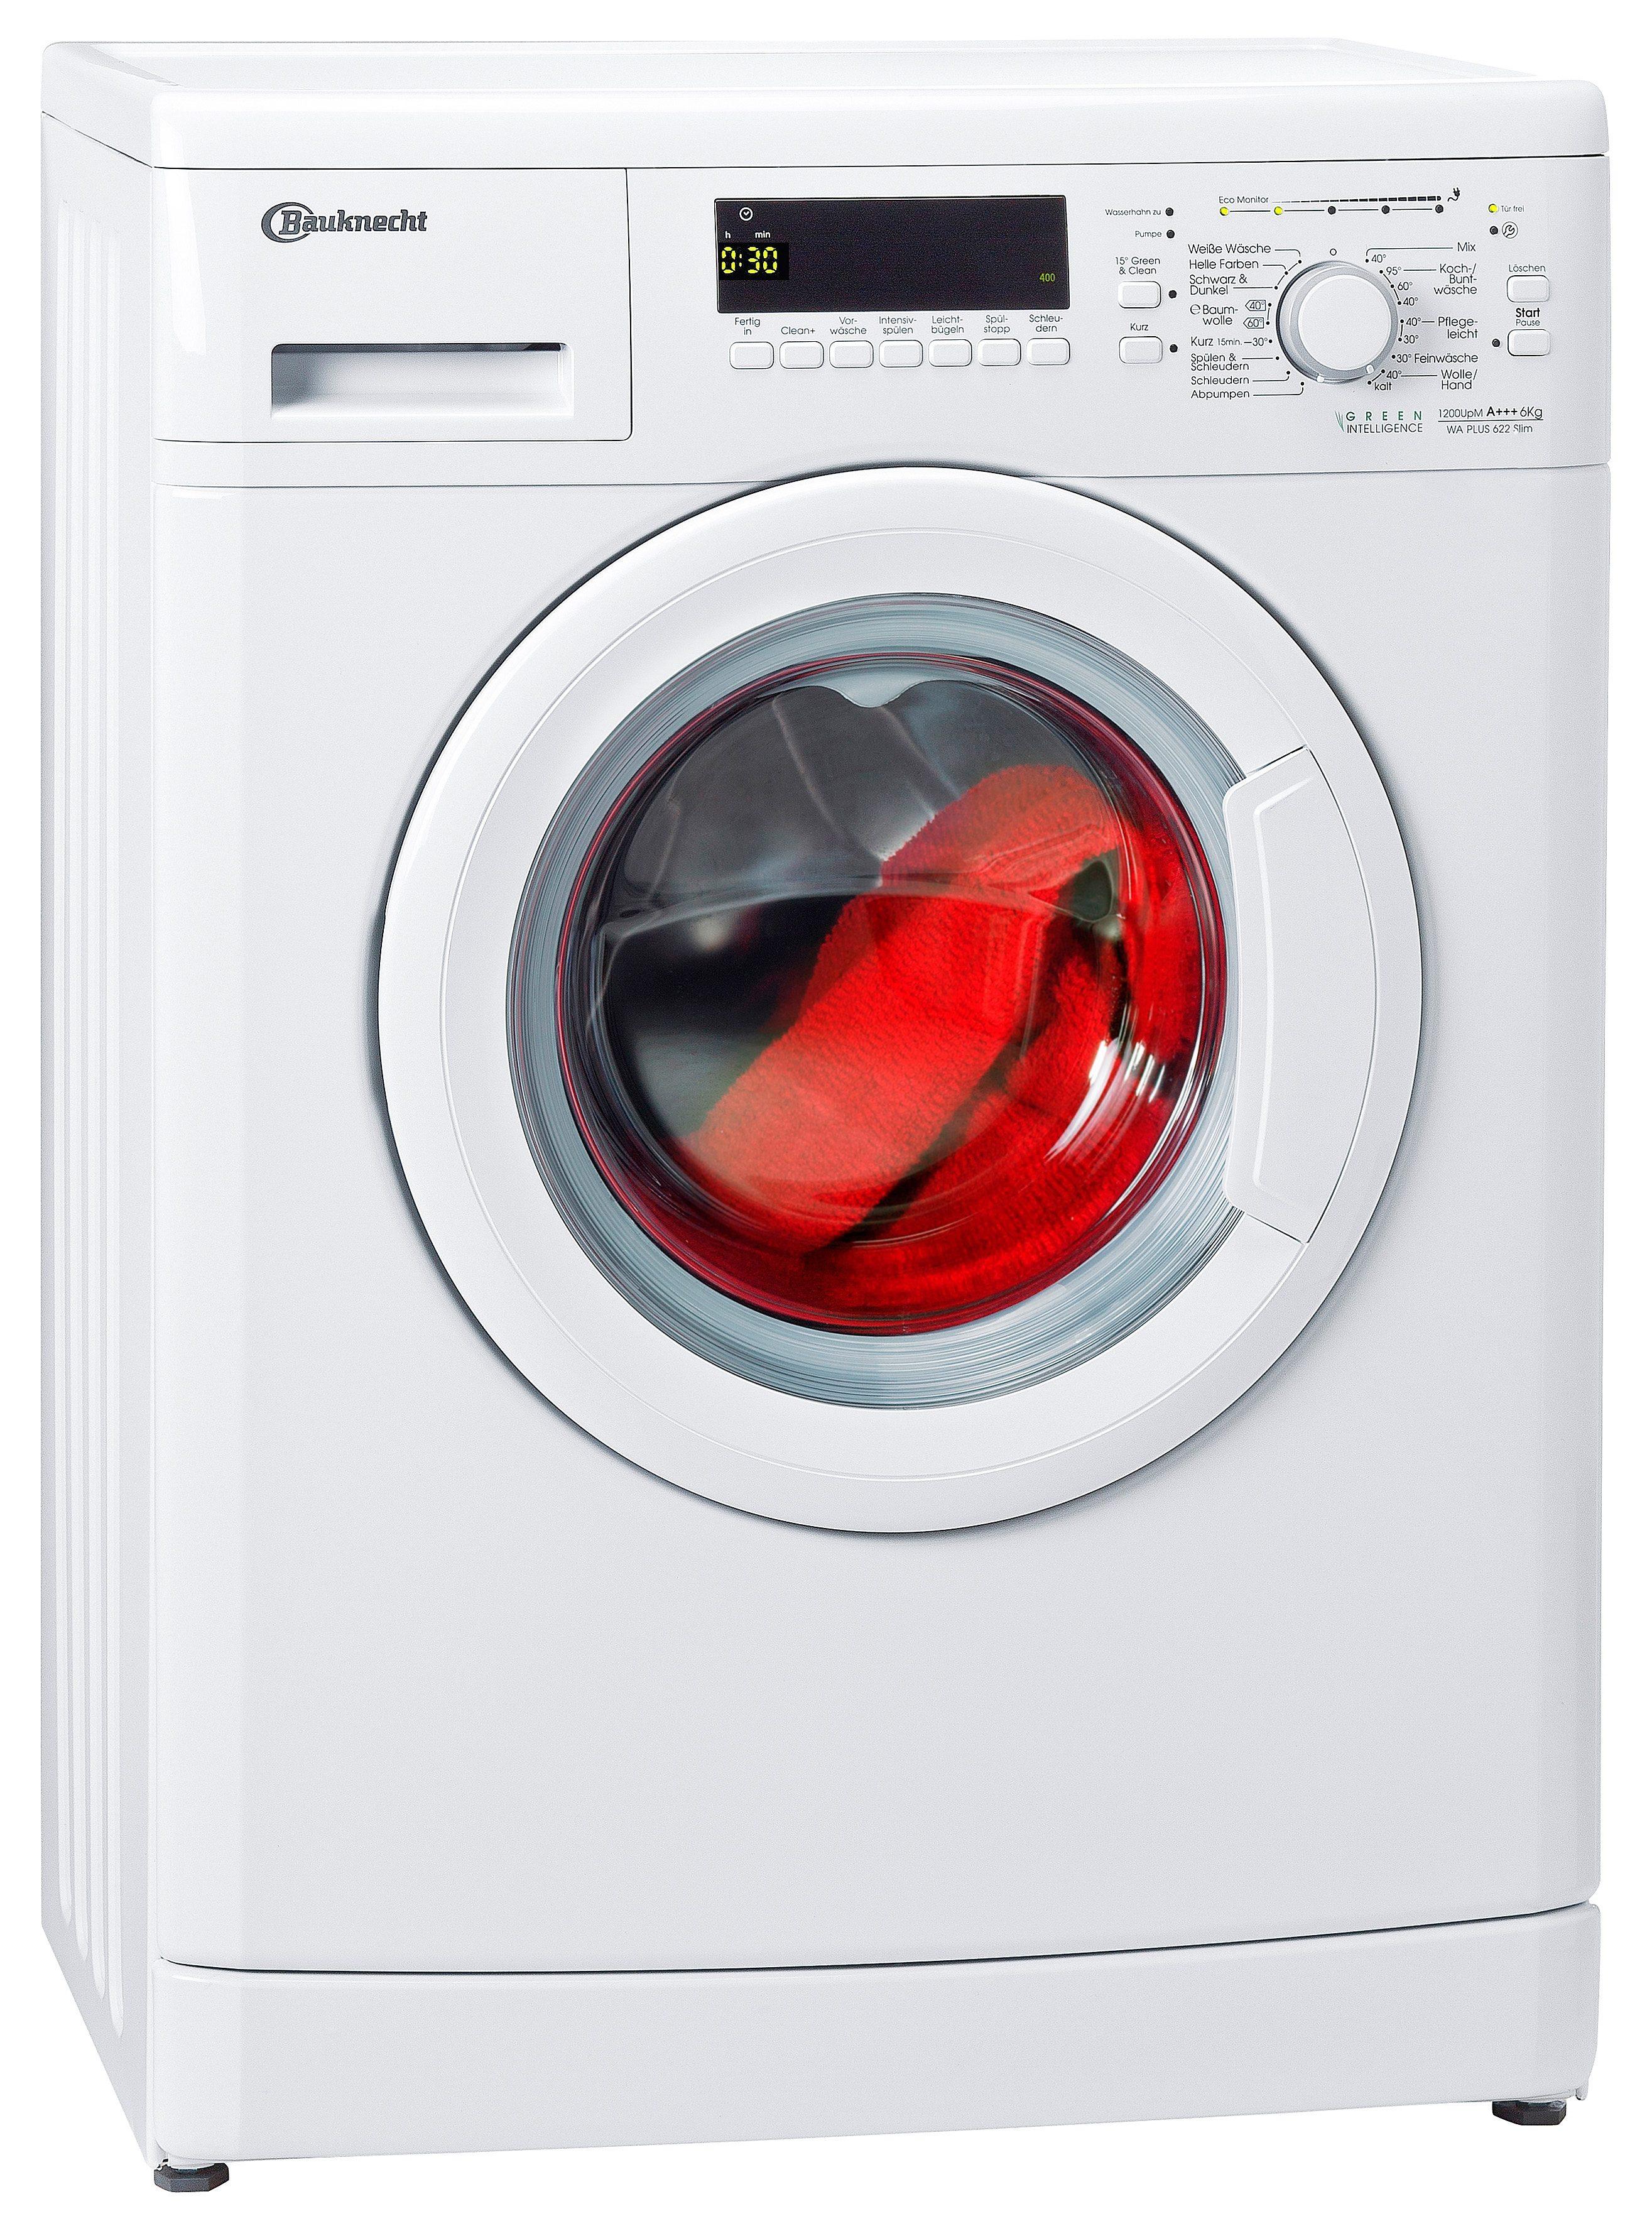 BAUKNECHT Waschmaschine WA PLUS 622 Slim, A+++, 6 kg, 1200 U/Min